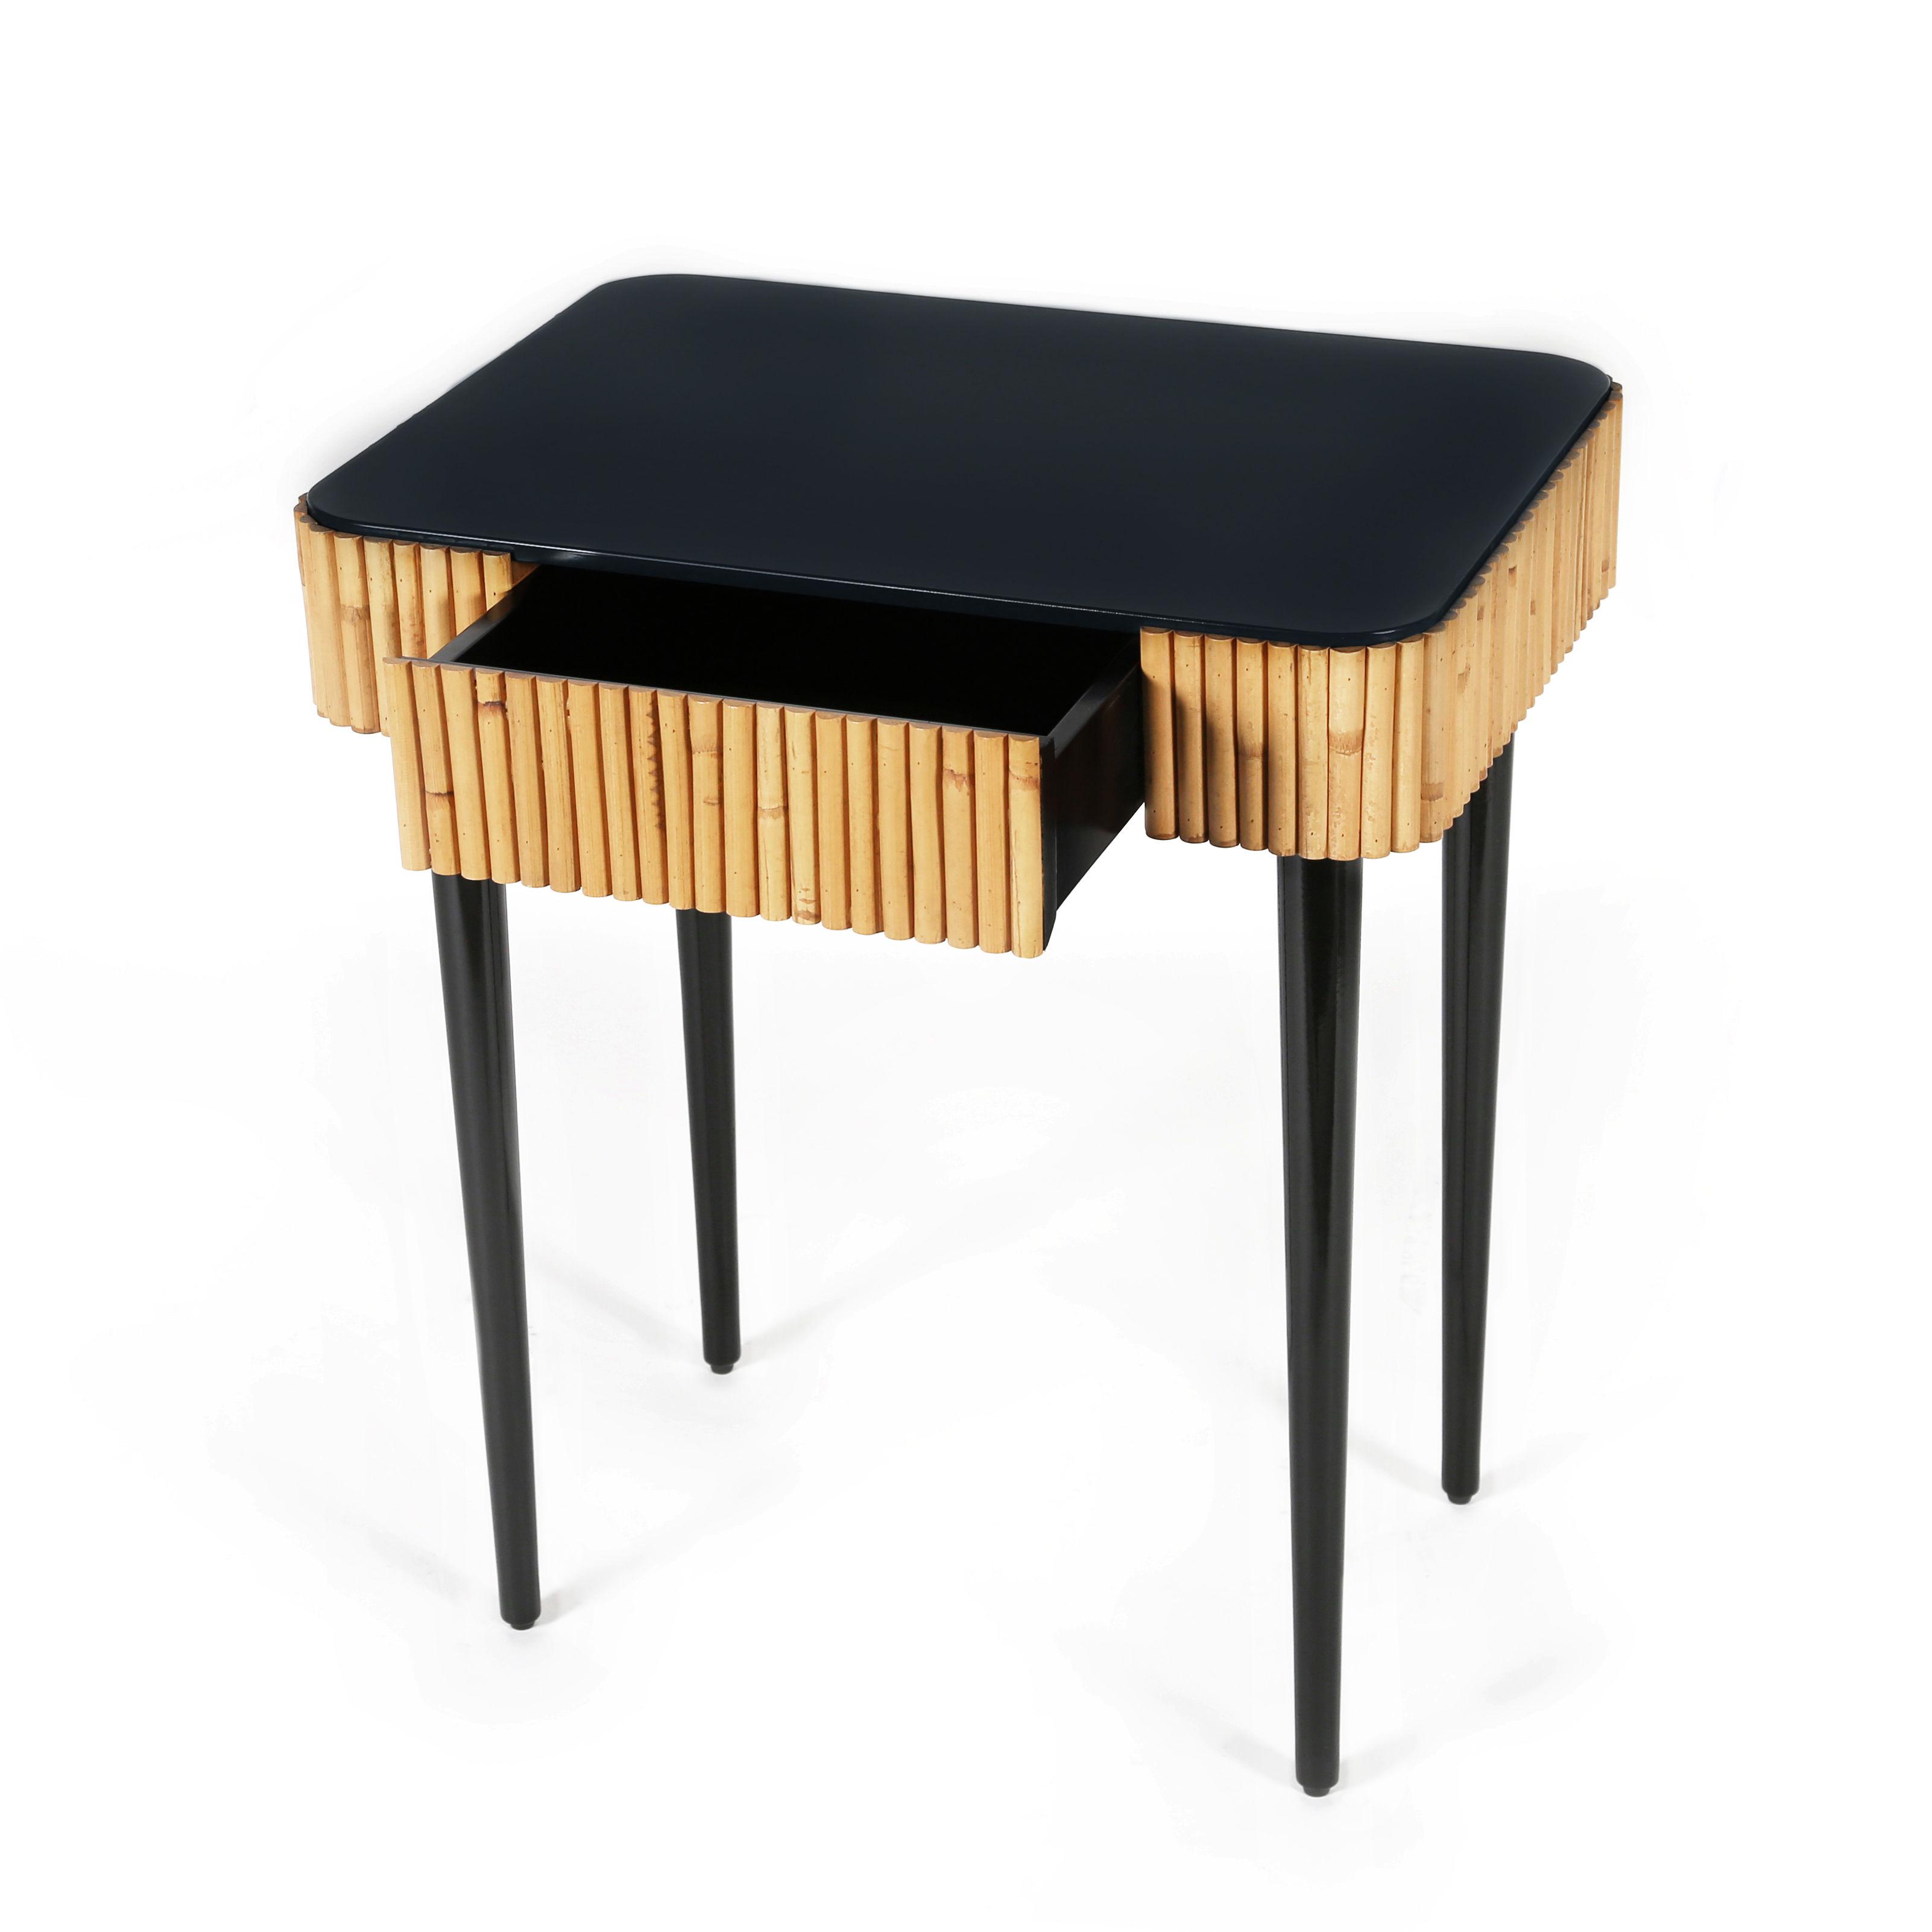 table d 39 appoint riviera rotin tiroir noir rotin naturel maison sarah lavoine. Black Bedroom Furniture Sets. Home Design Ideas